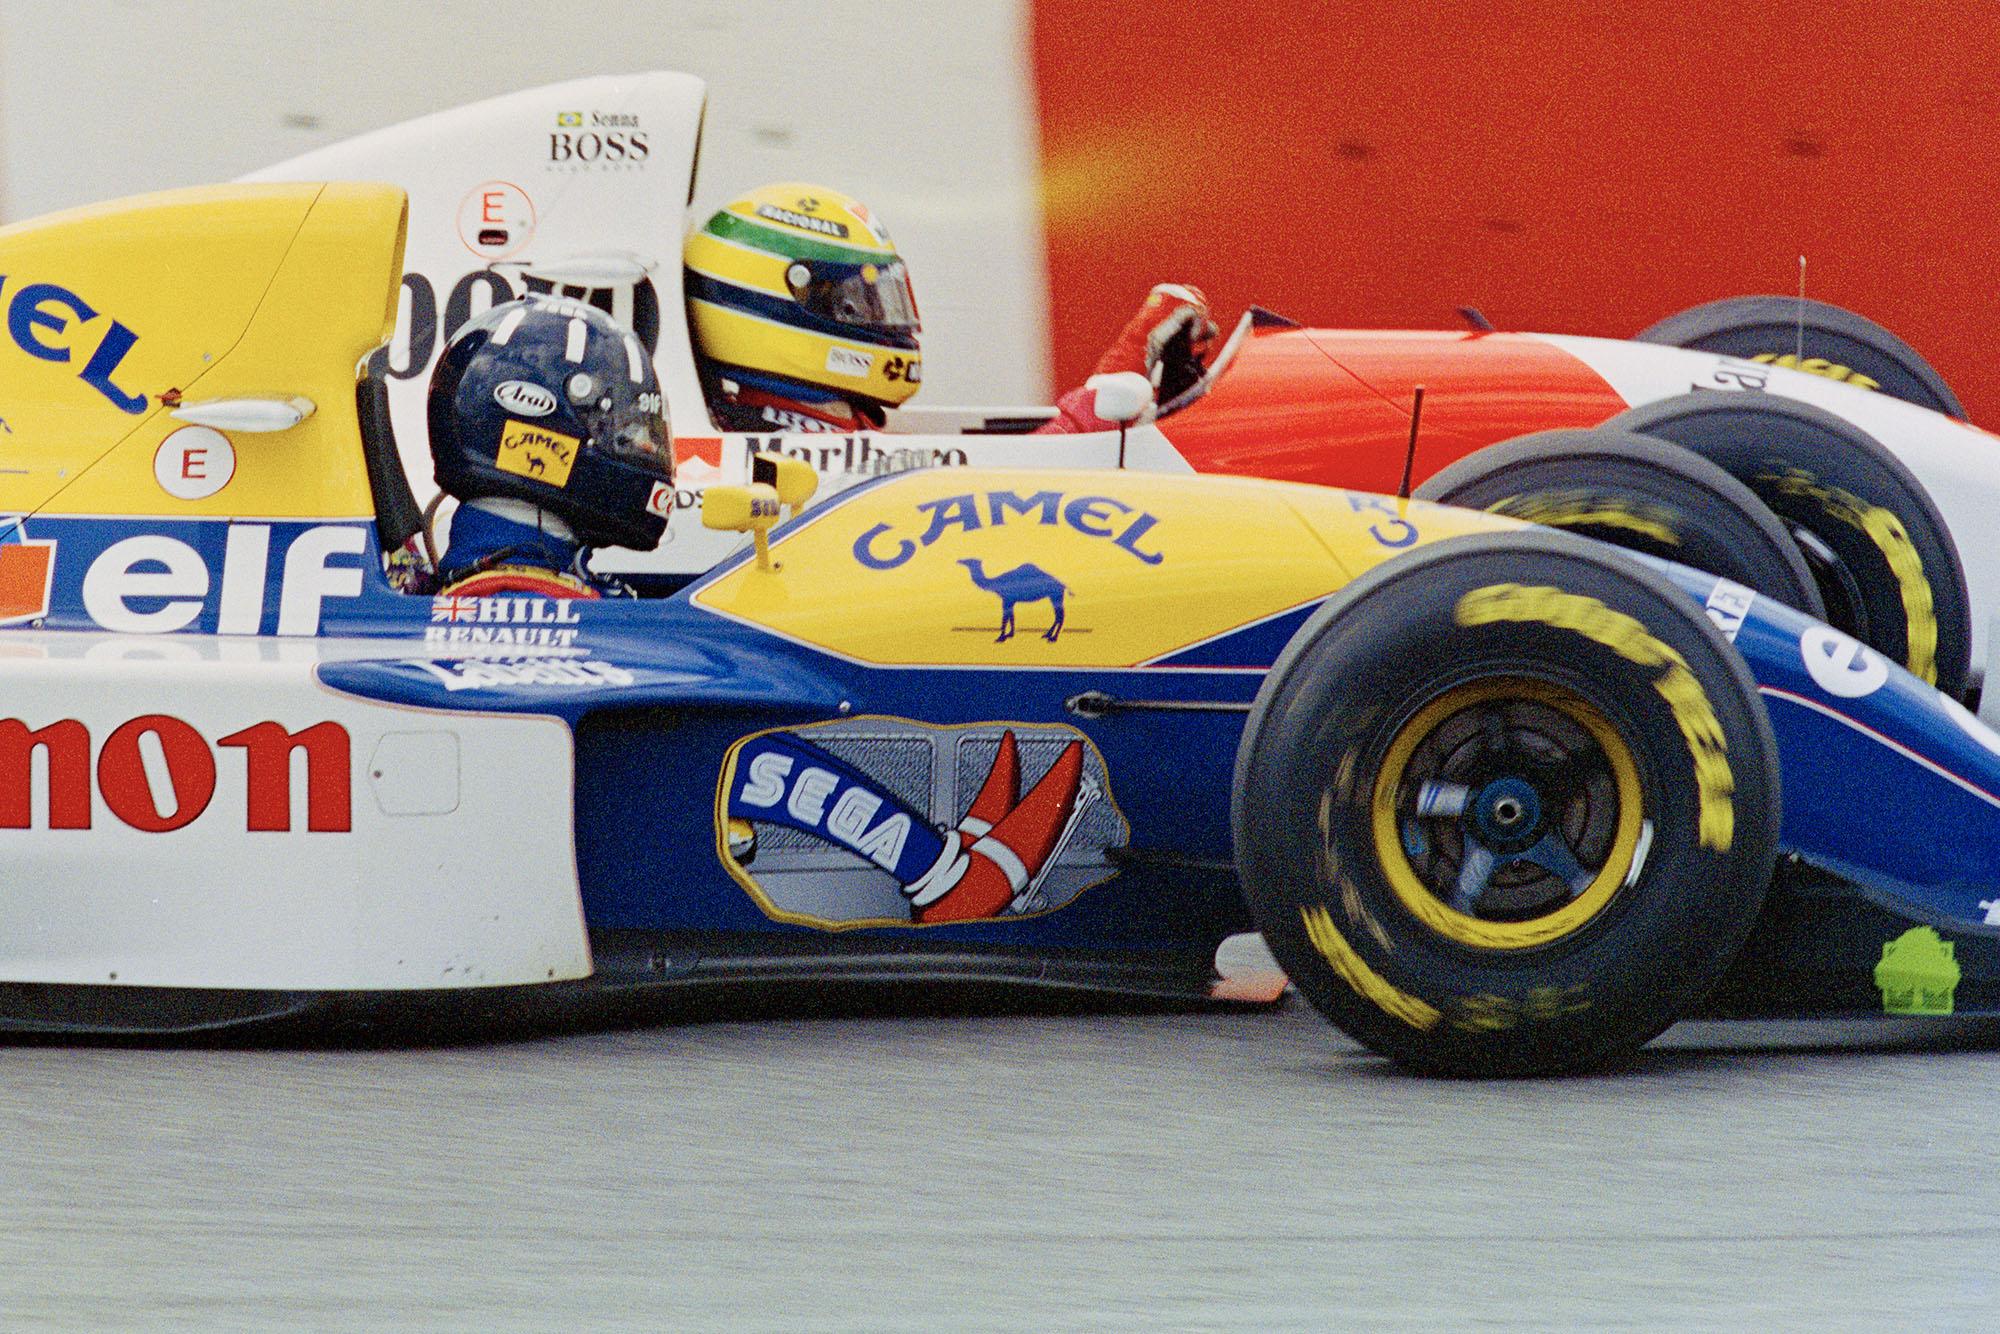 Ayrton Senna alongside Damon Hill at the 1993 Brazilian Grand Prix